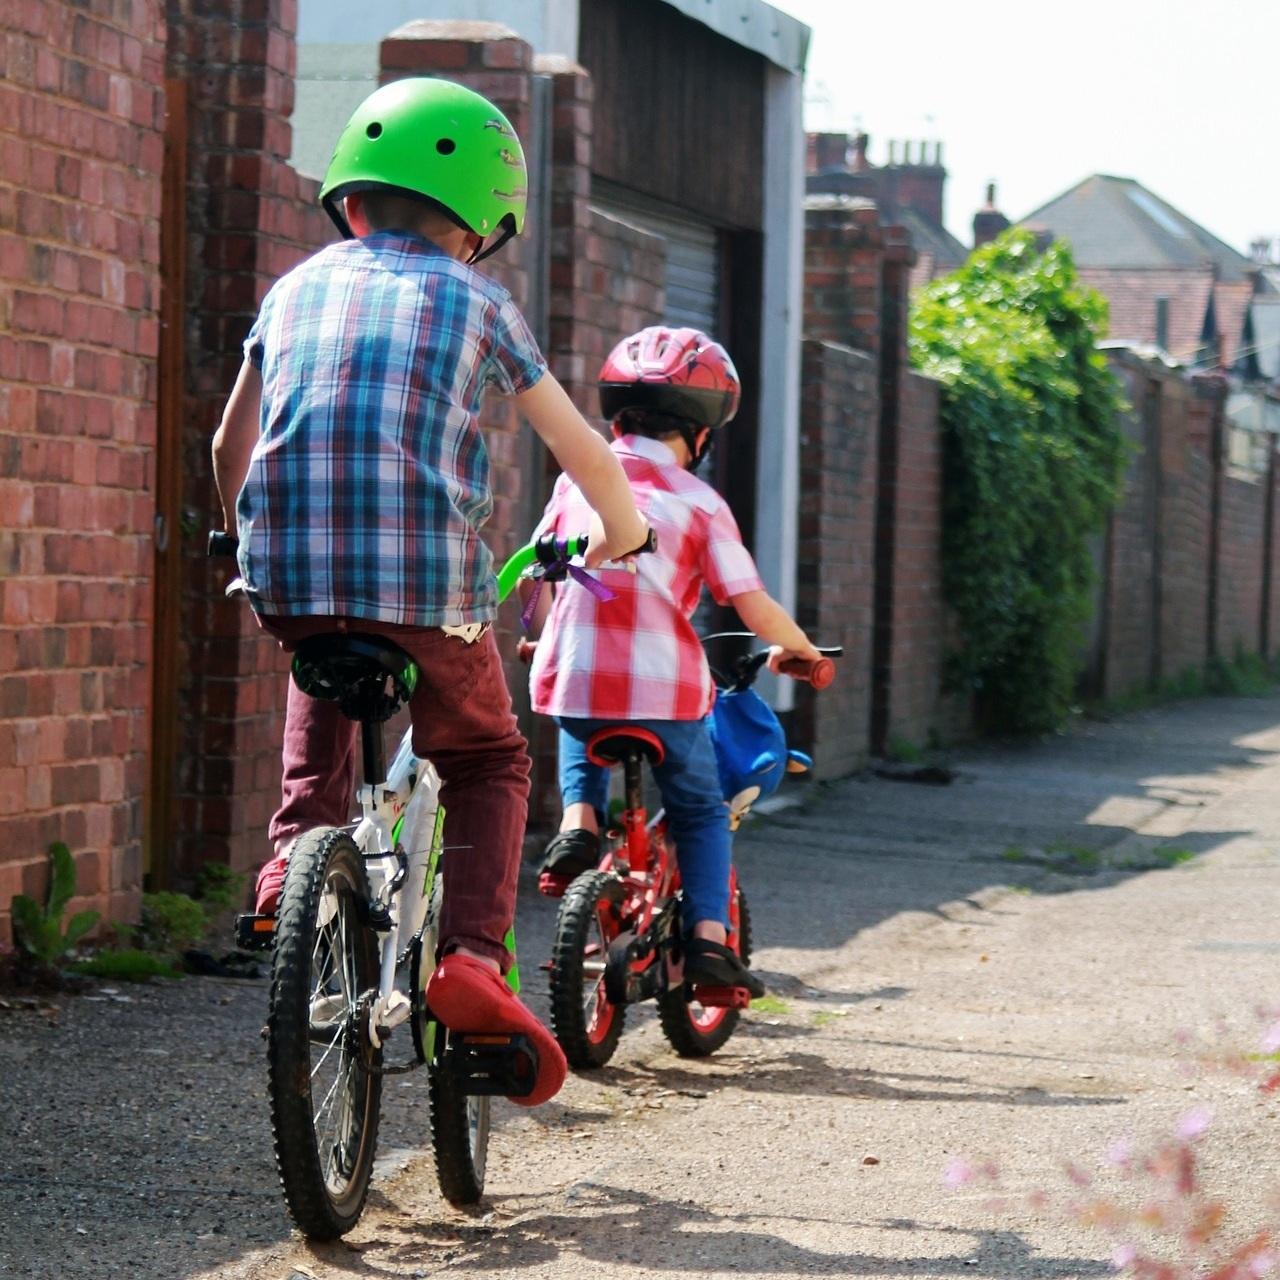 kids ot biking occupational therapy alley-1836919_1920.jpg